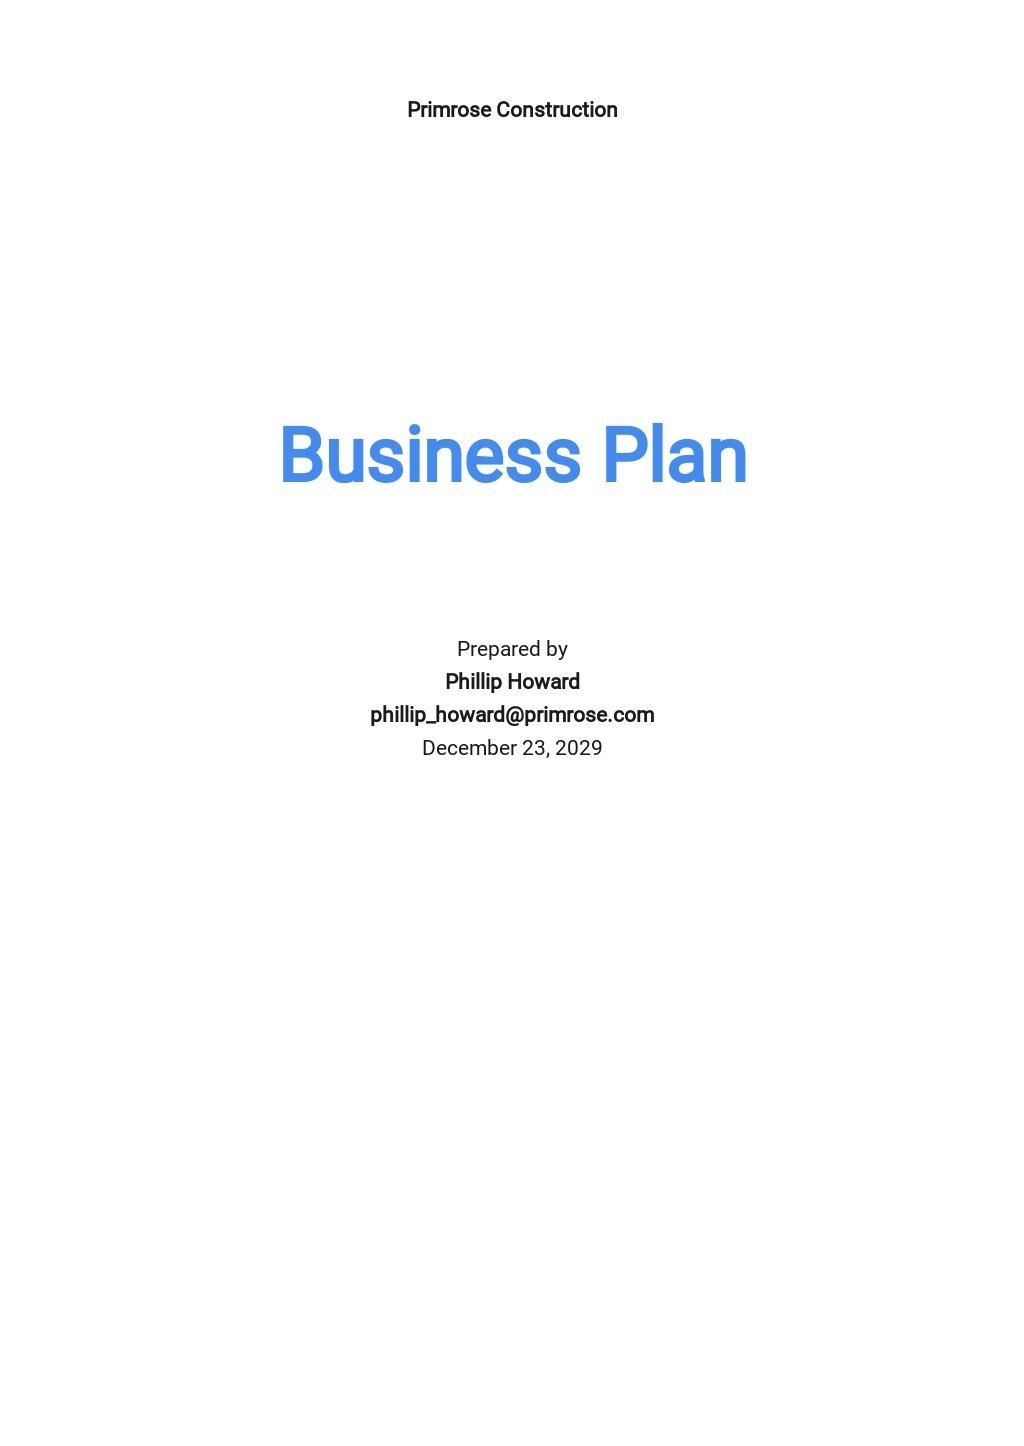 Commercial Construction Business Plan Template.jpe